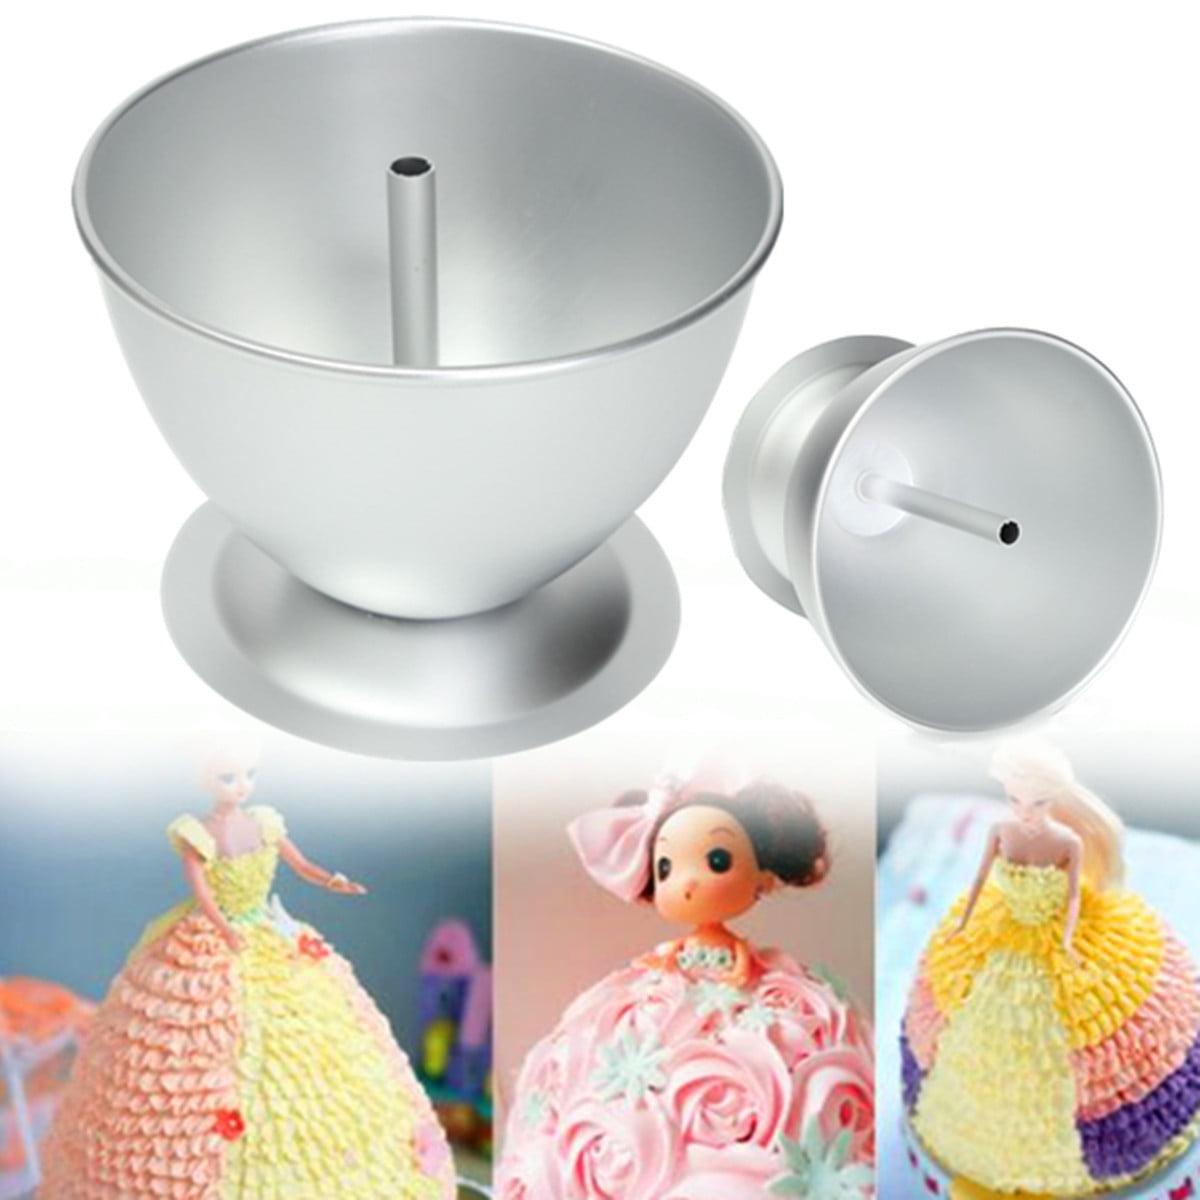 3D Princess Dress Doll Cake Mould Fondant Baking Pan Tin Decorate Making Molds Kitchen Tool by